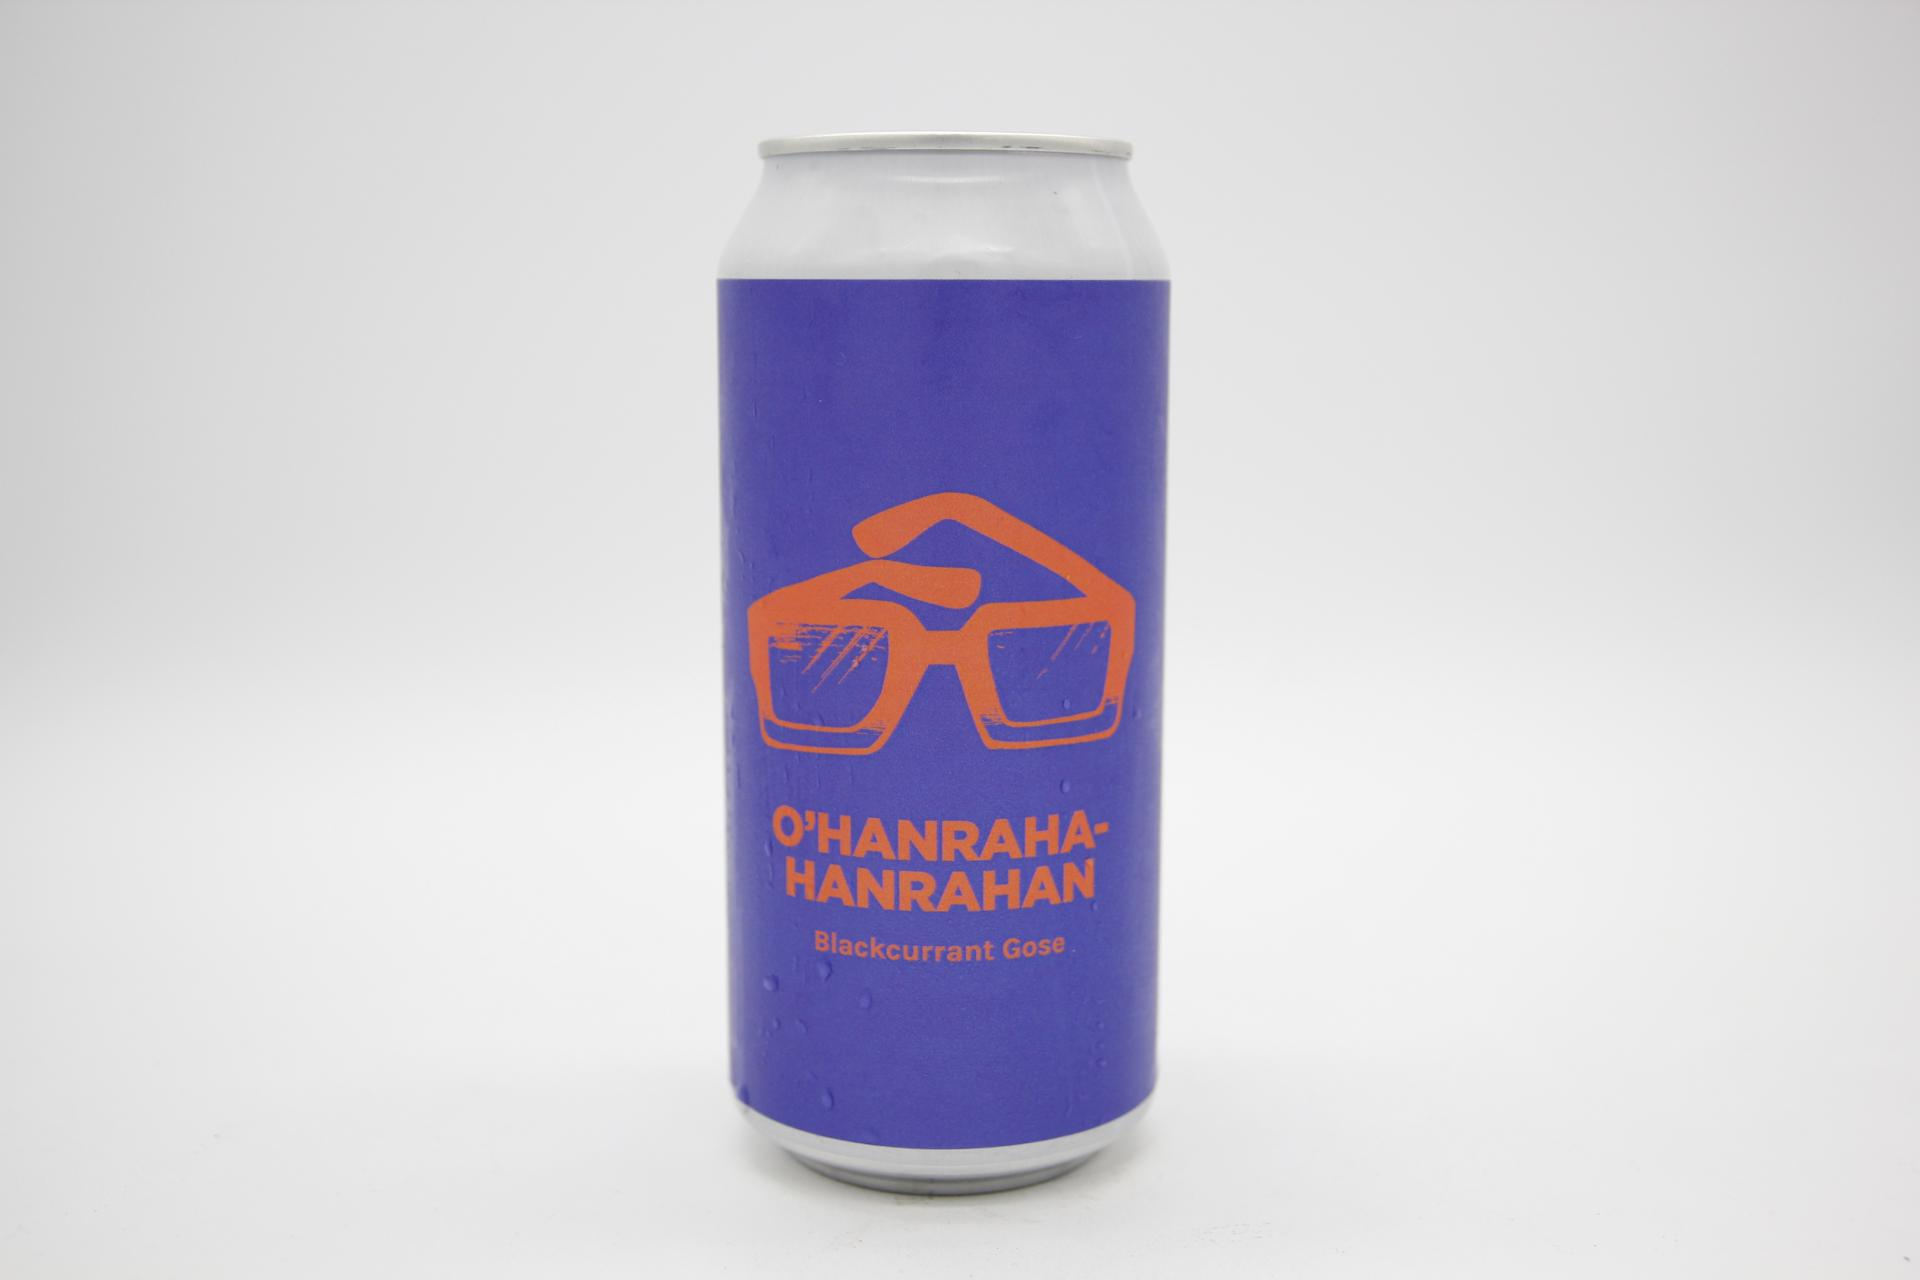 POMONA ISLAND - O'HANRAHA-HANRAHAN 44cl